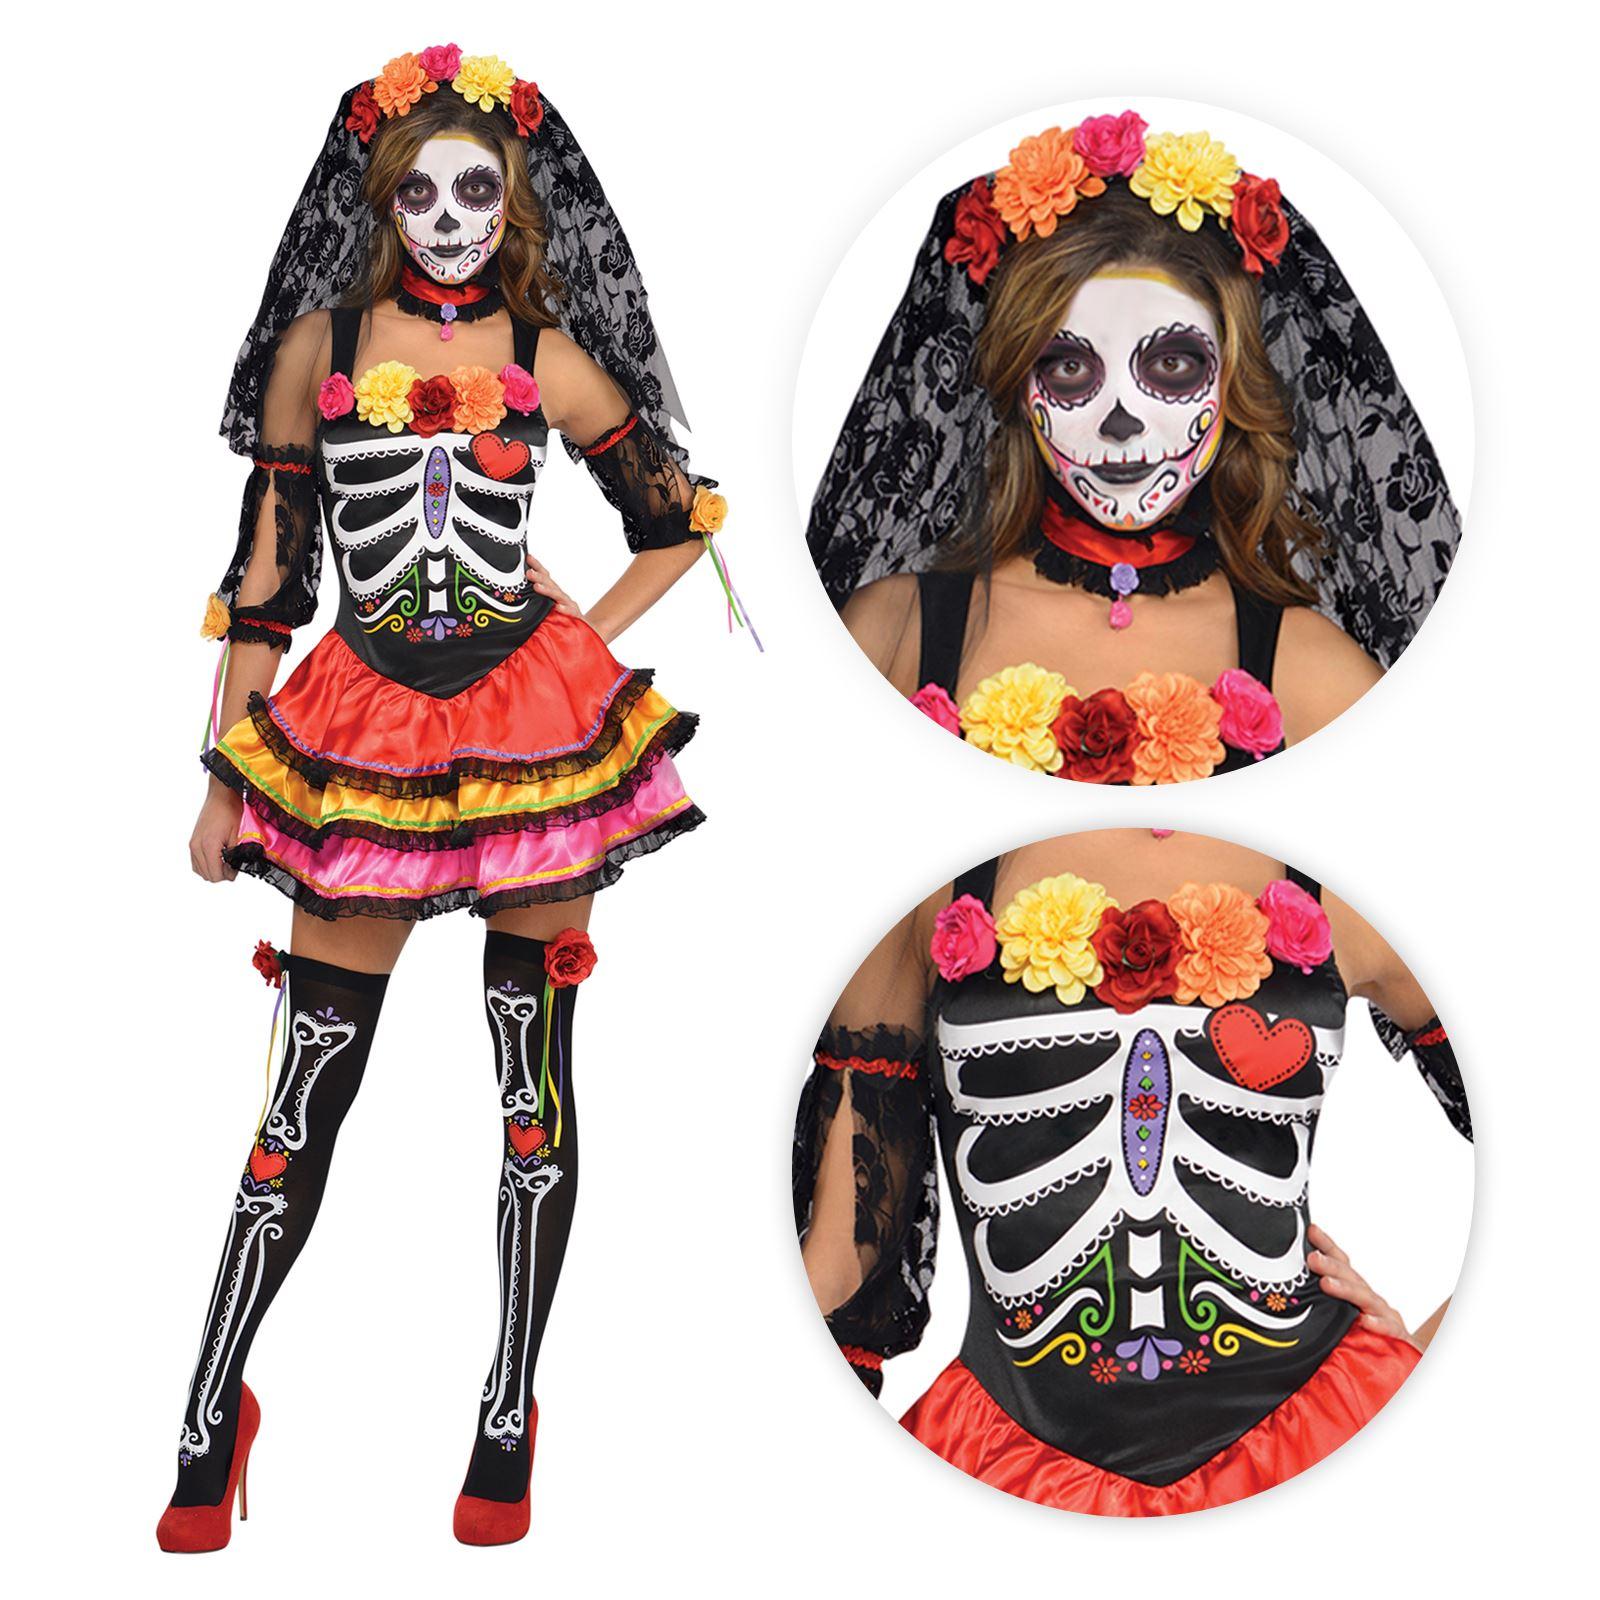 fce805673a04d Details about Ladies Day of the Dead Senorita Sugar Halloween Skeleton  Fancy Dress Costume UK